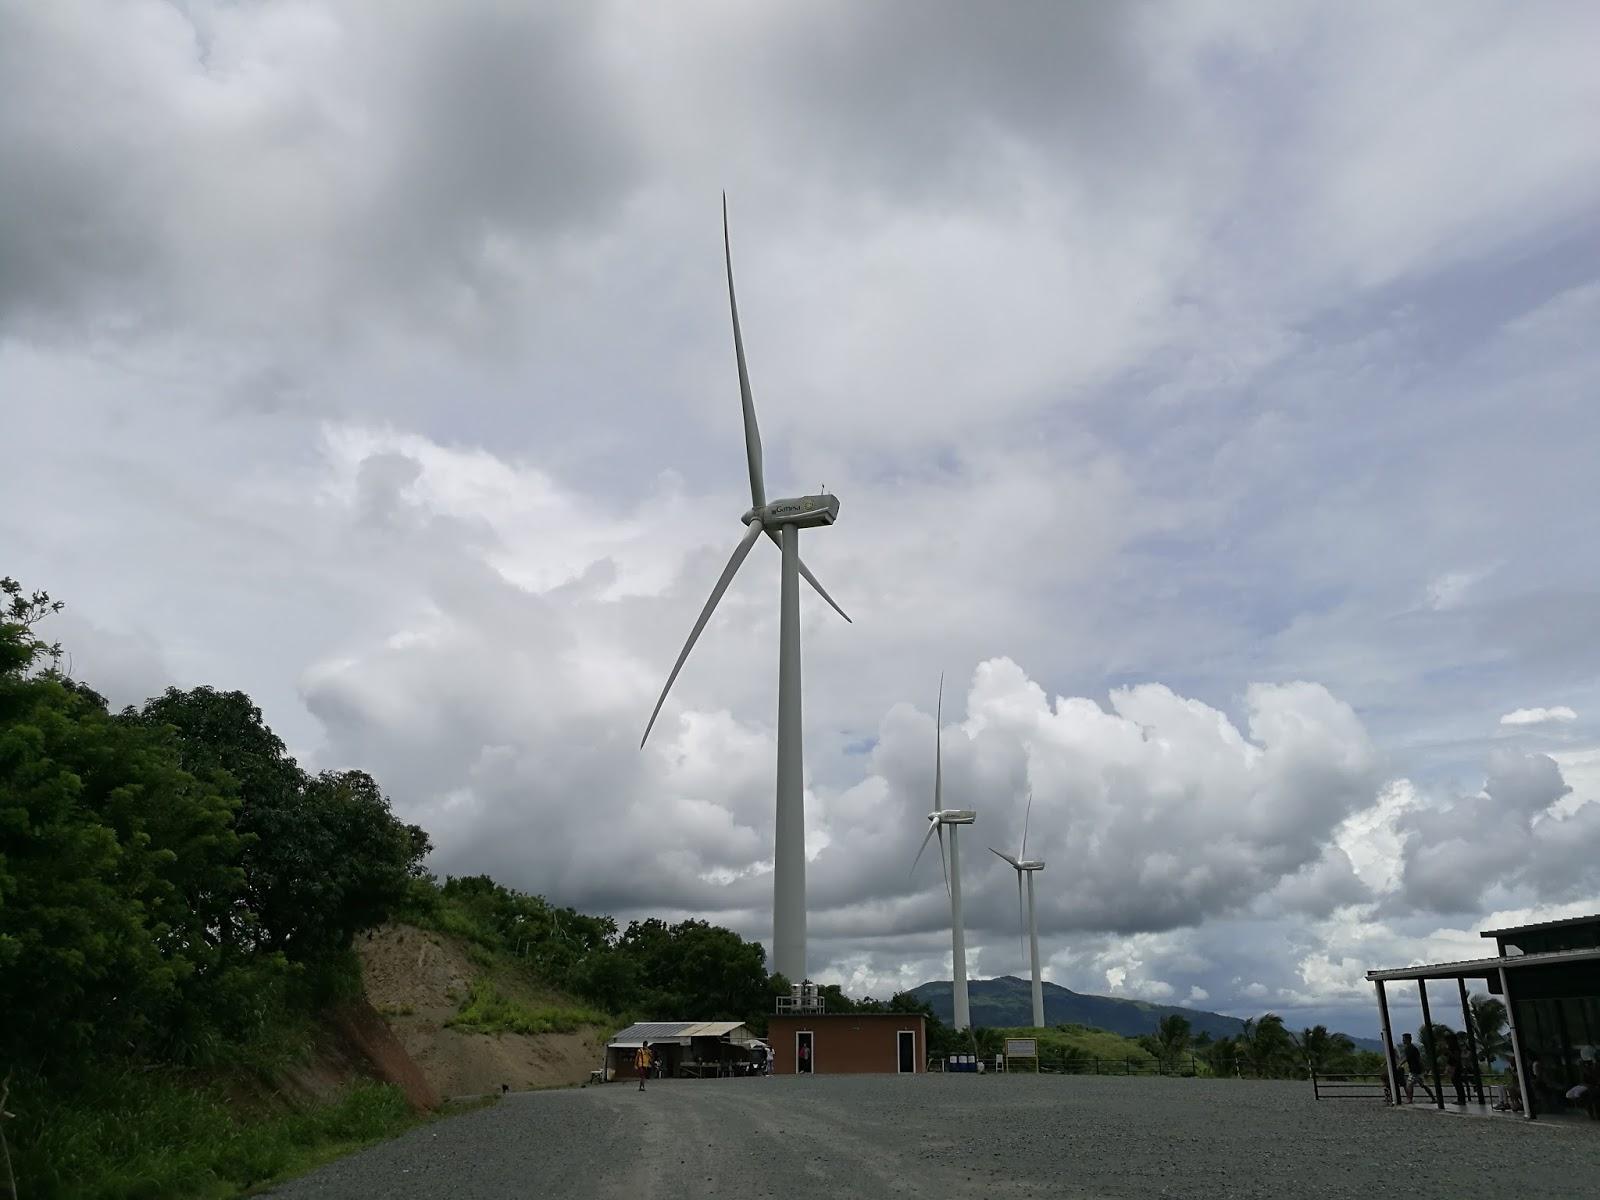 Huawei P9 Sample Camera Shot - Windmill